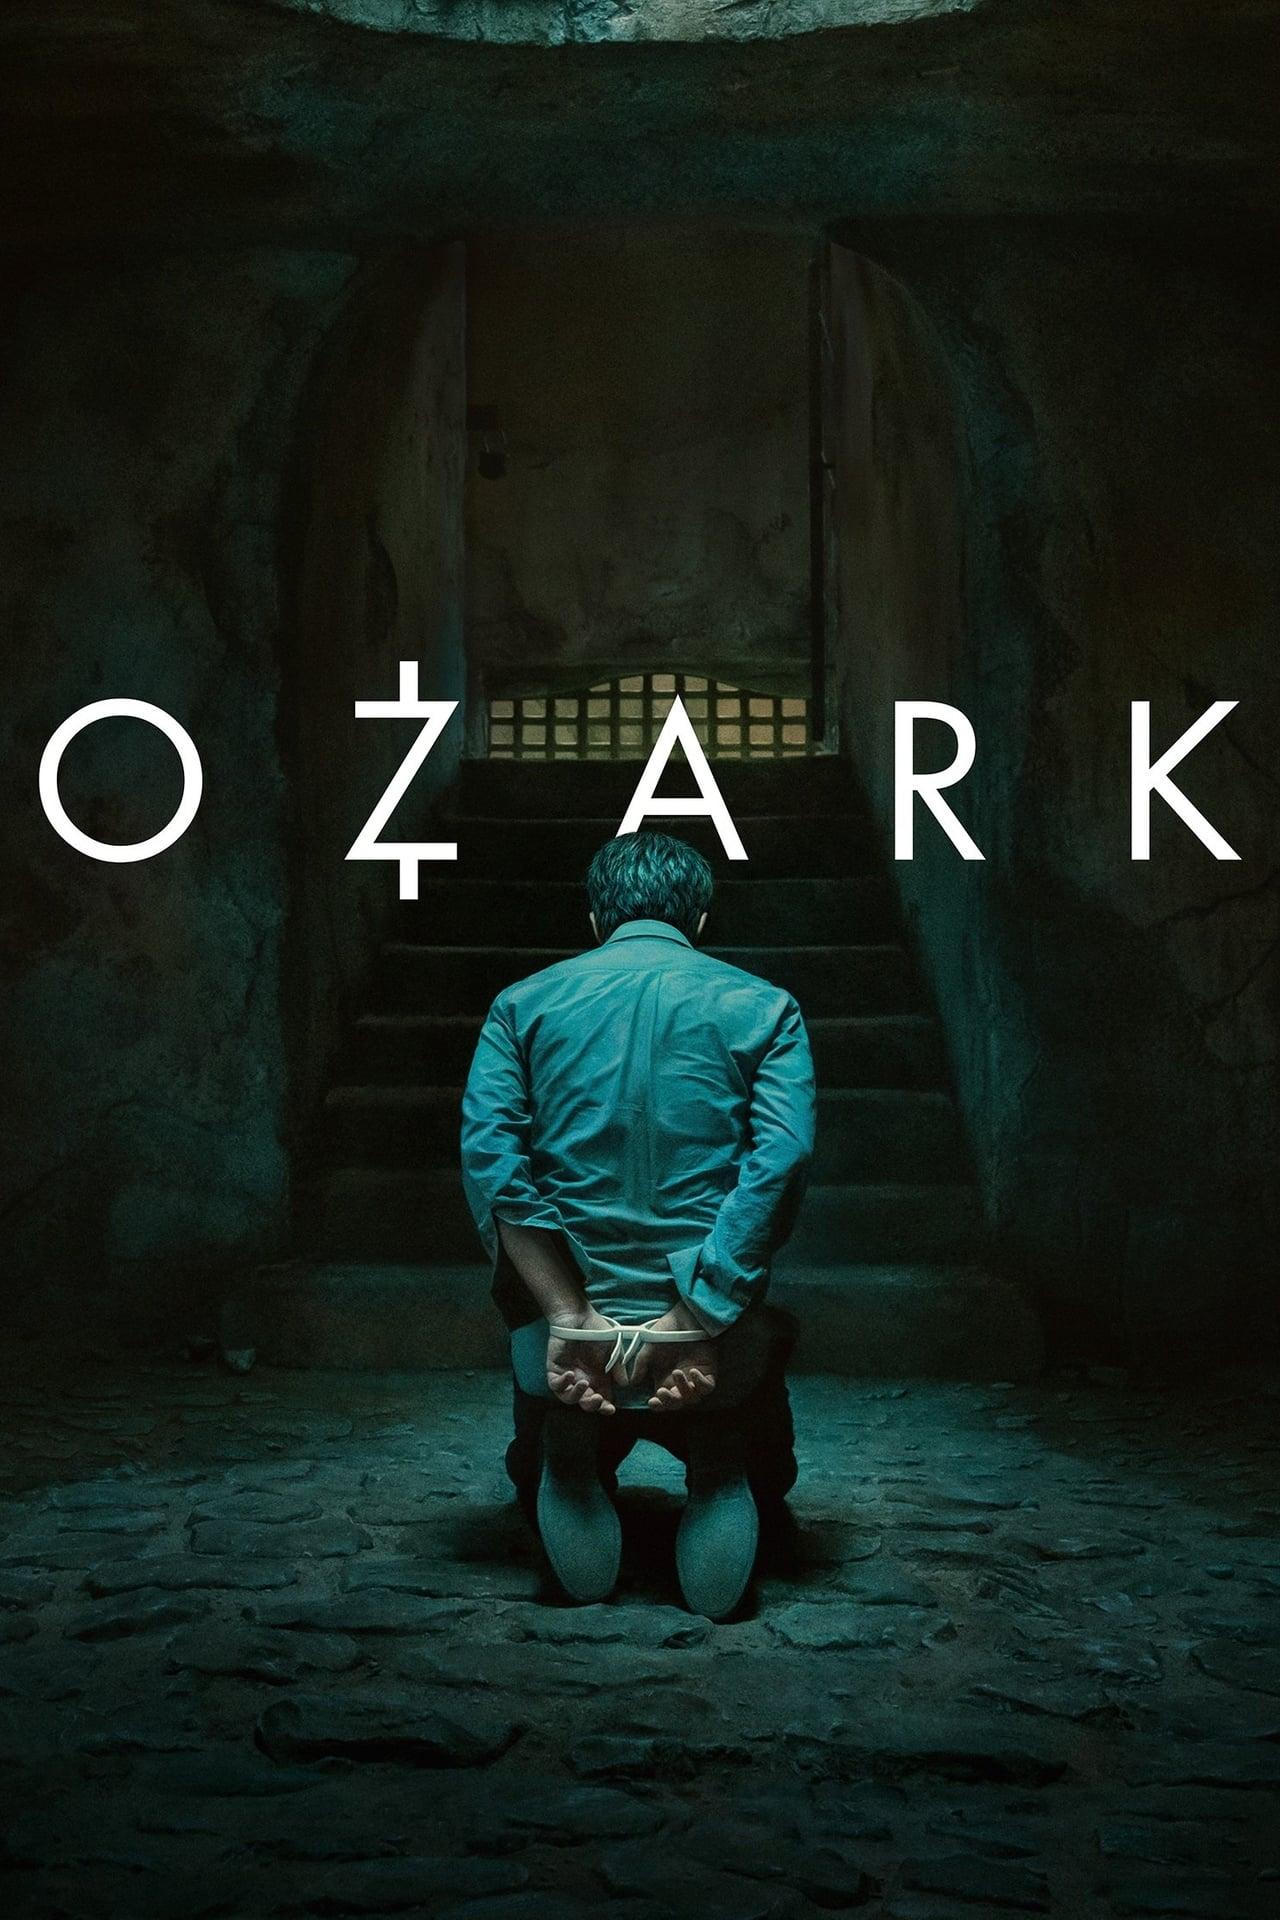 phim âu mỹ ozark